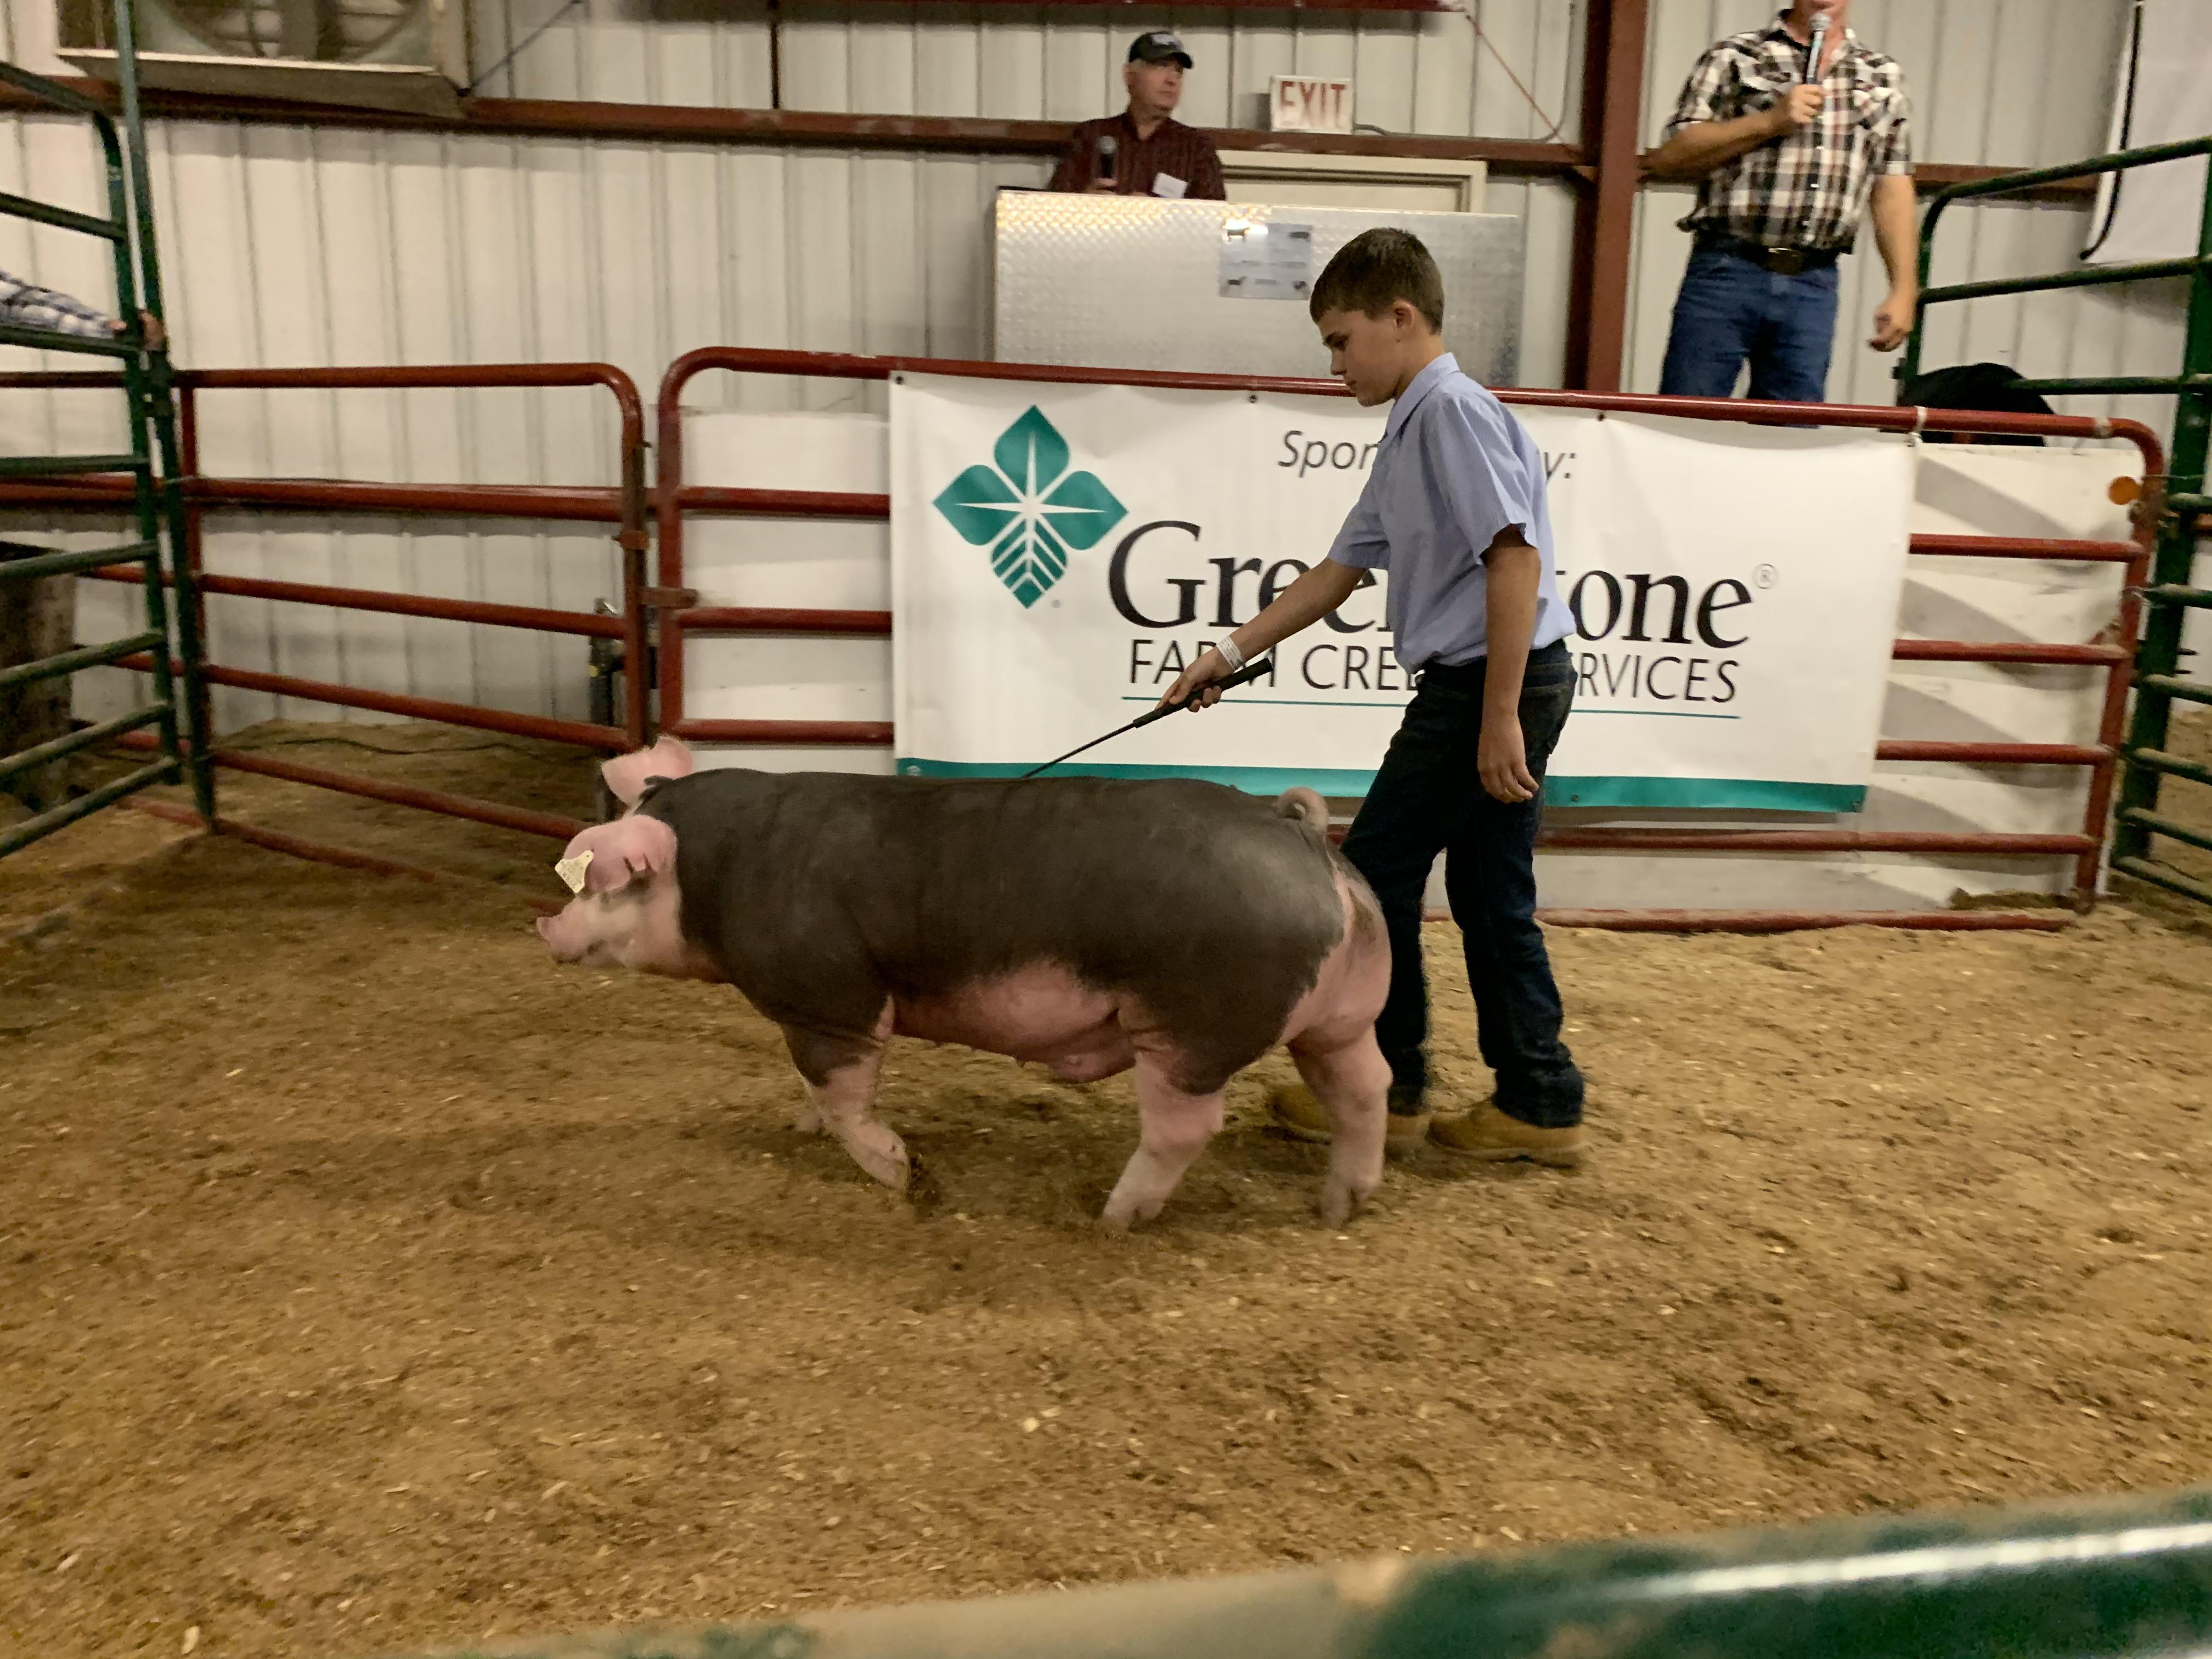 Gresham FFA member Charlie Huffman walks his hog around the ring as visitors bid on it during the livestock auction at the Shawano County Fair on Sept. 3.Luke Reimer | NEW Media